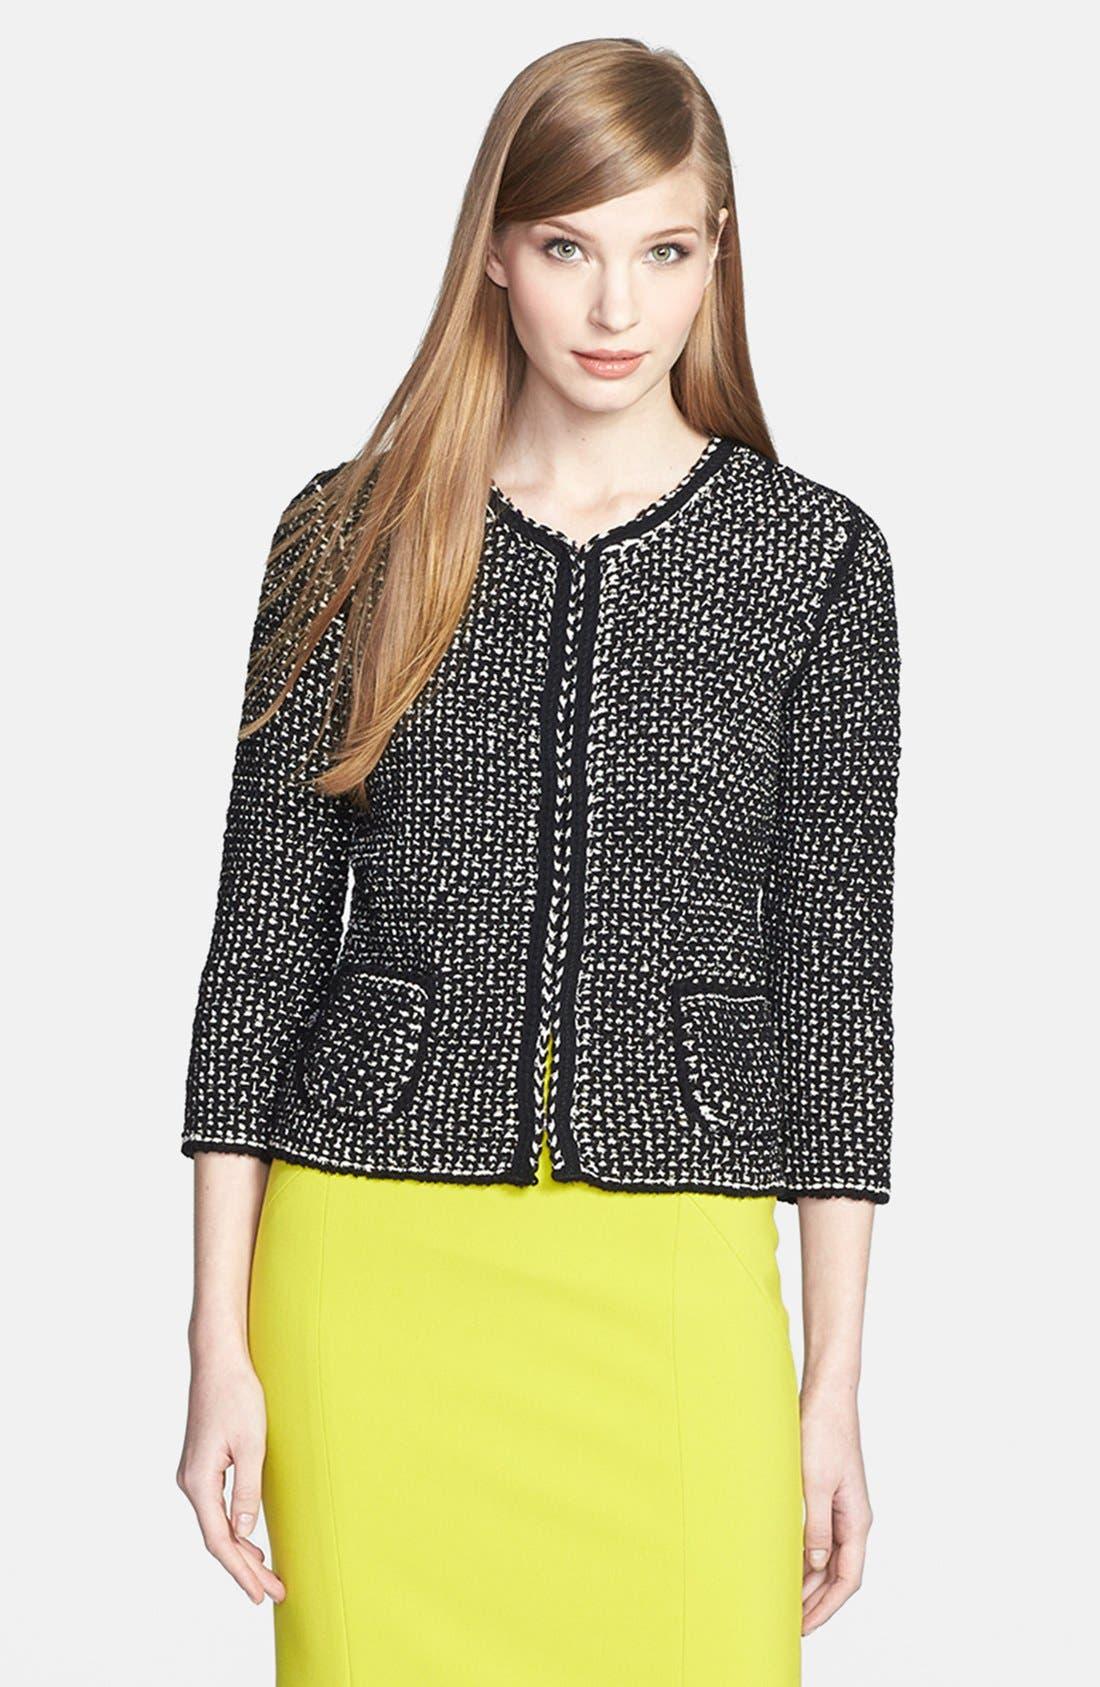 Main Image - BOSS HUGO BOSS Cotton Blend Sweater Jacket